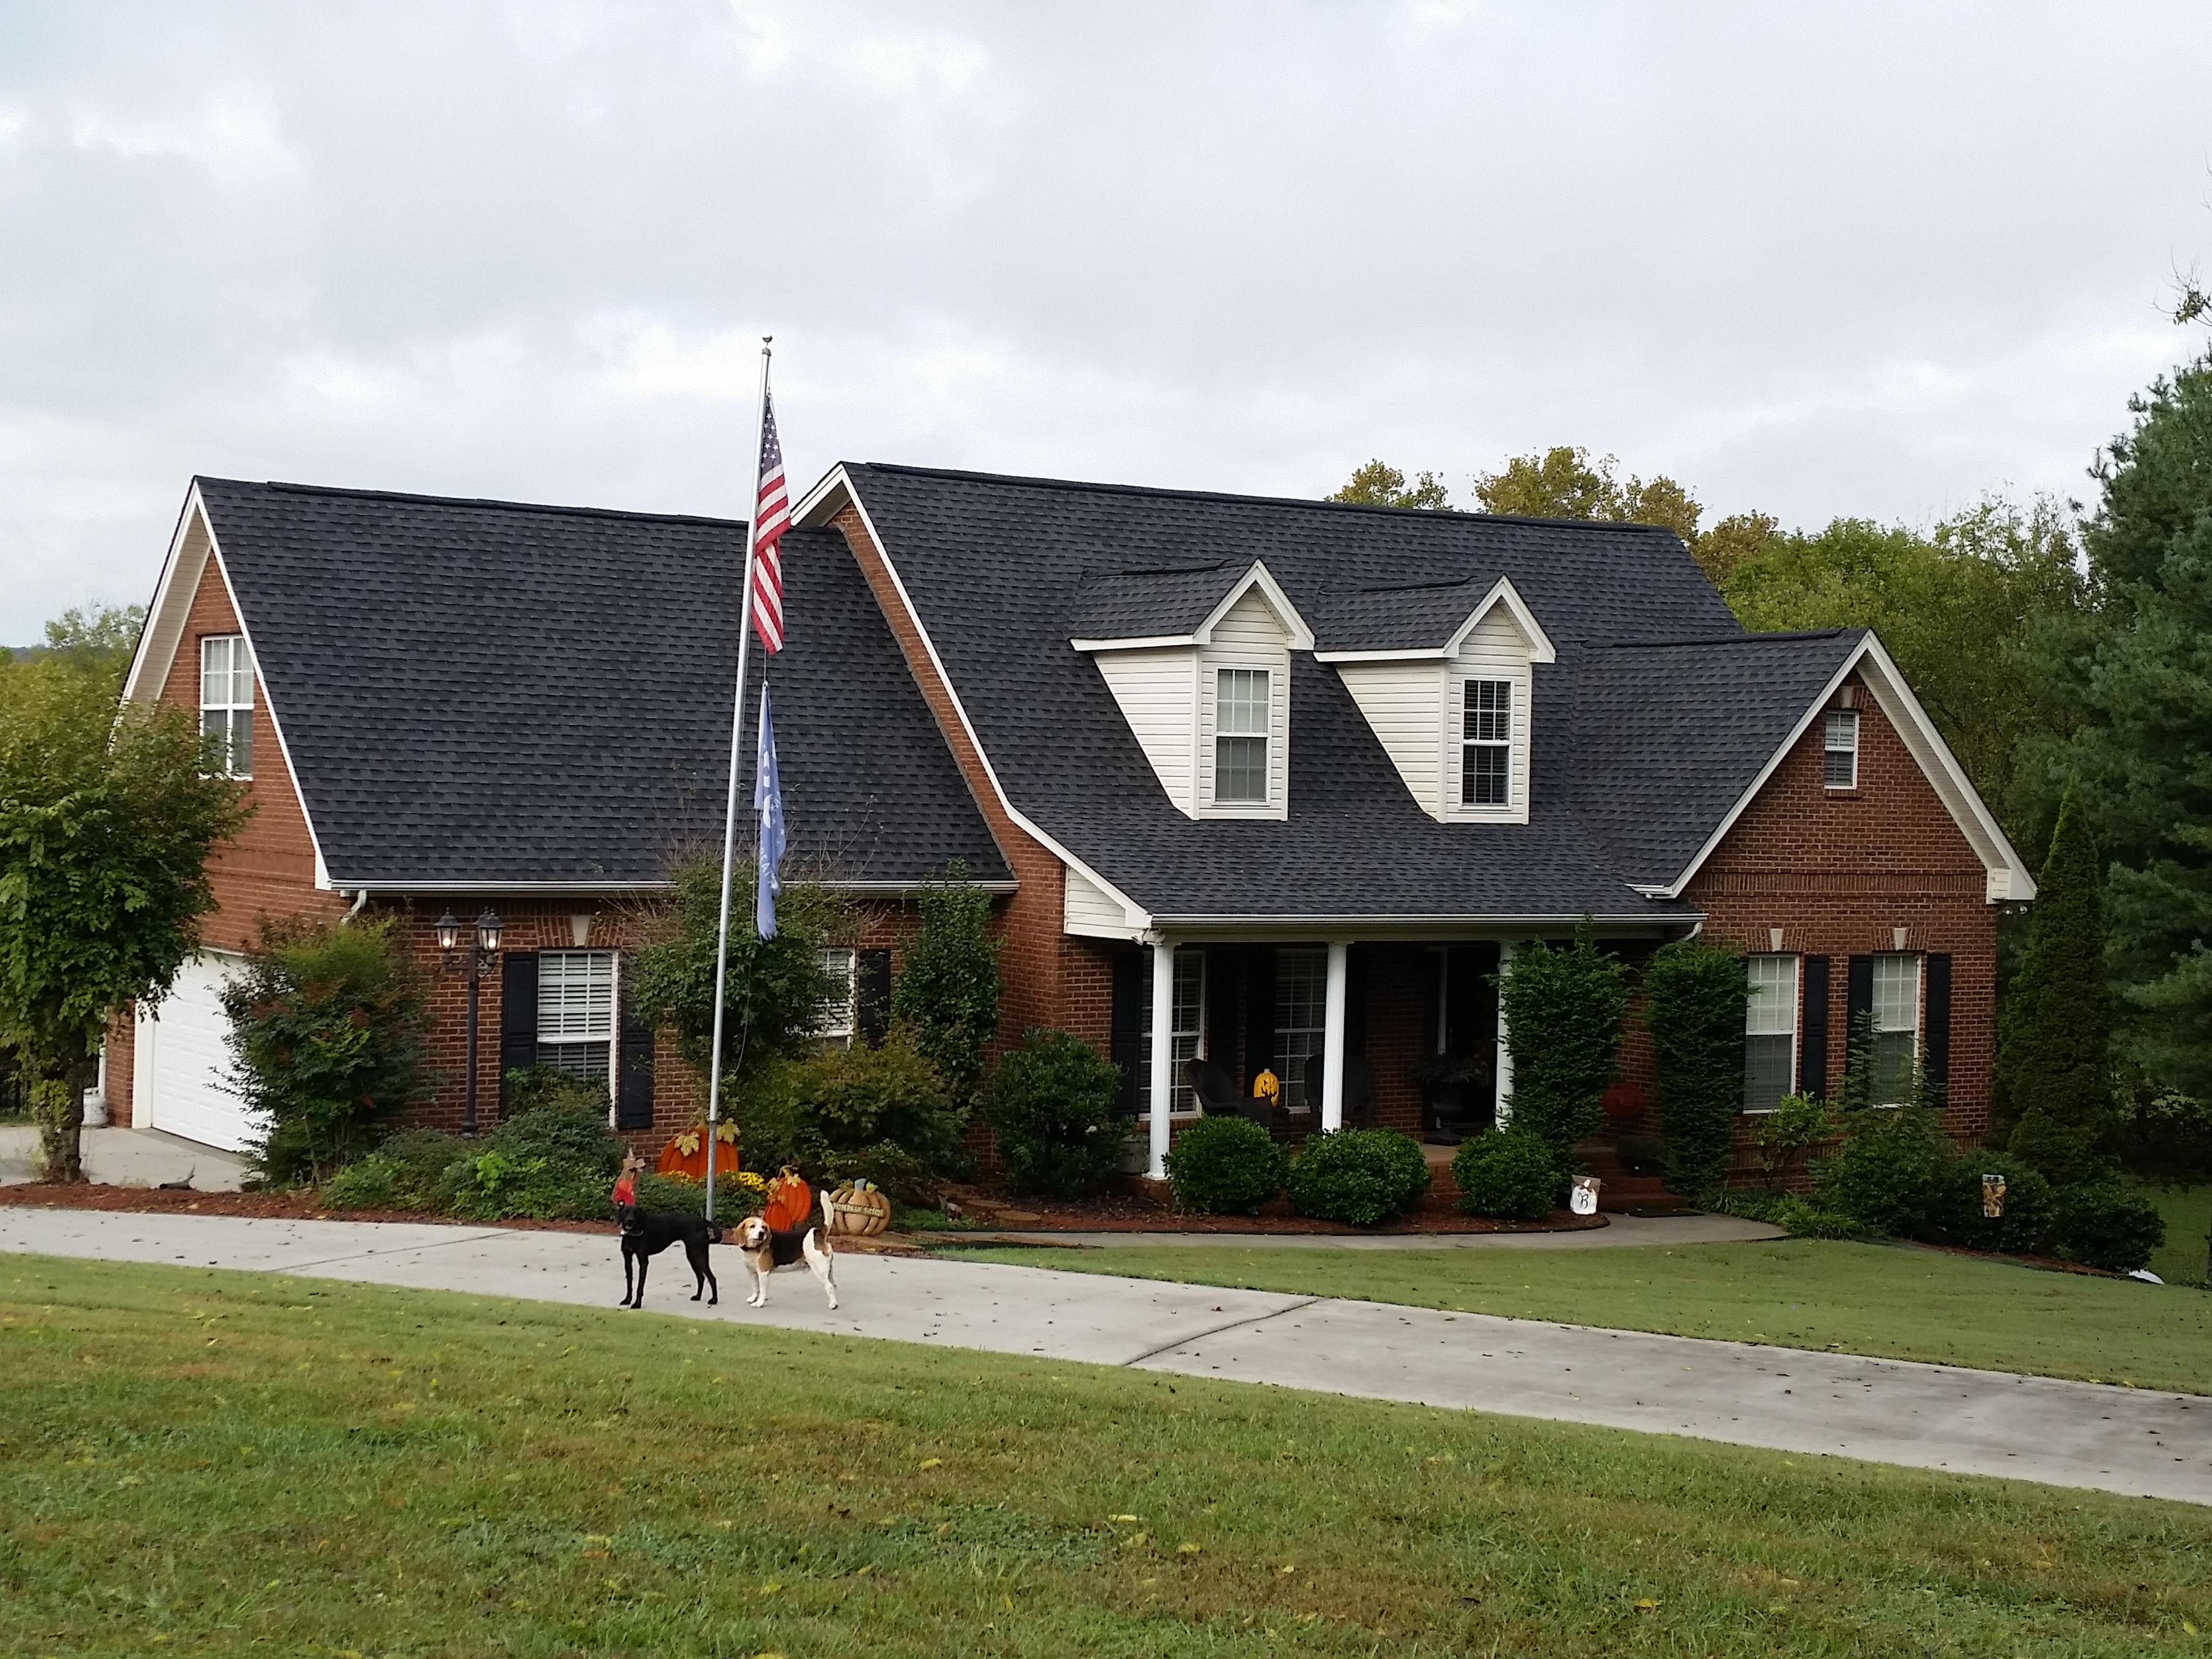 Smithson Bros Roofing Llc In Cleveland Tn 37311